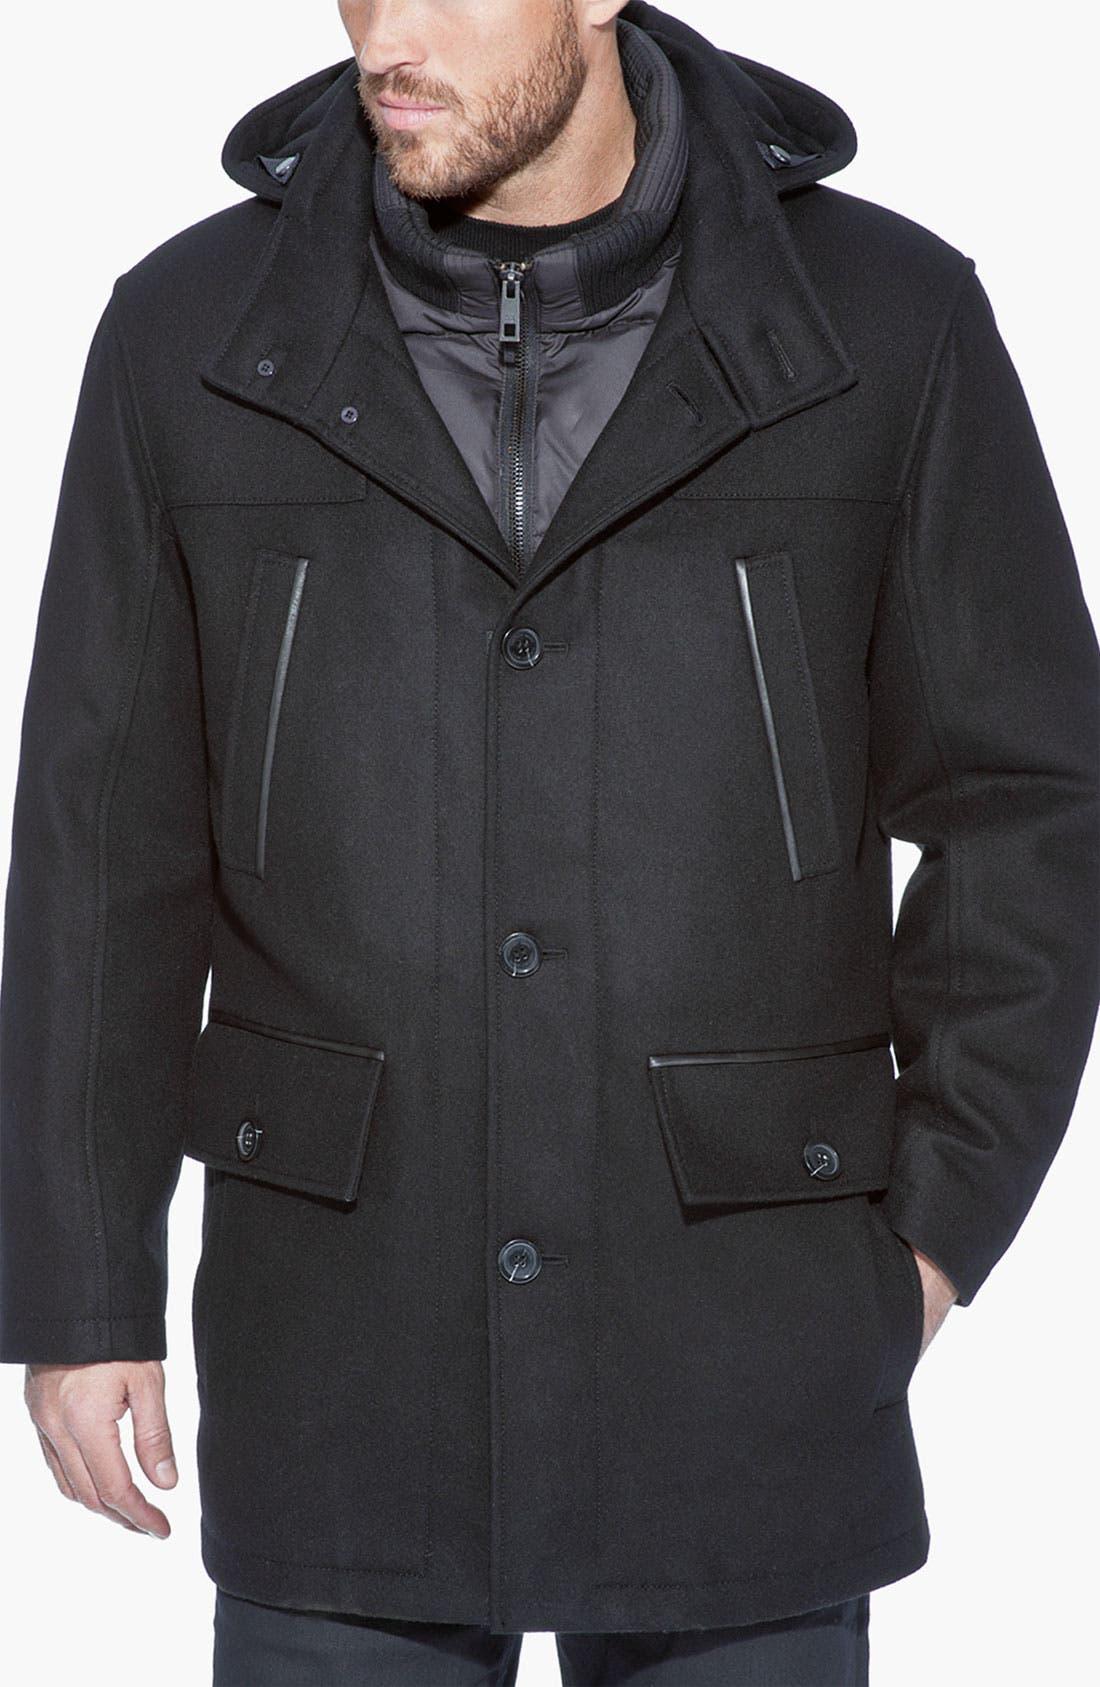 Main Image - Andrew Marc 'Weber' Water Resistant Wool Blend Jacket